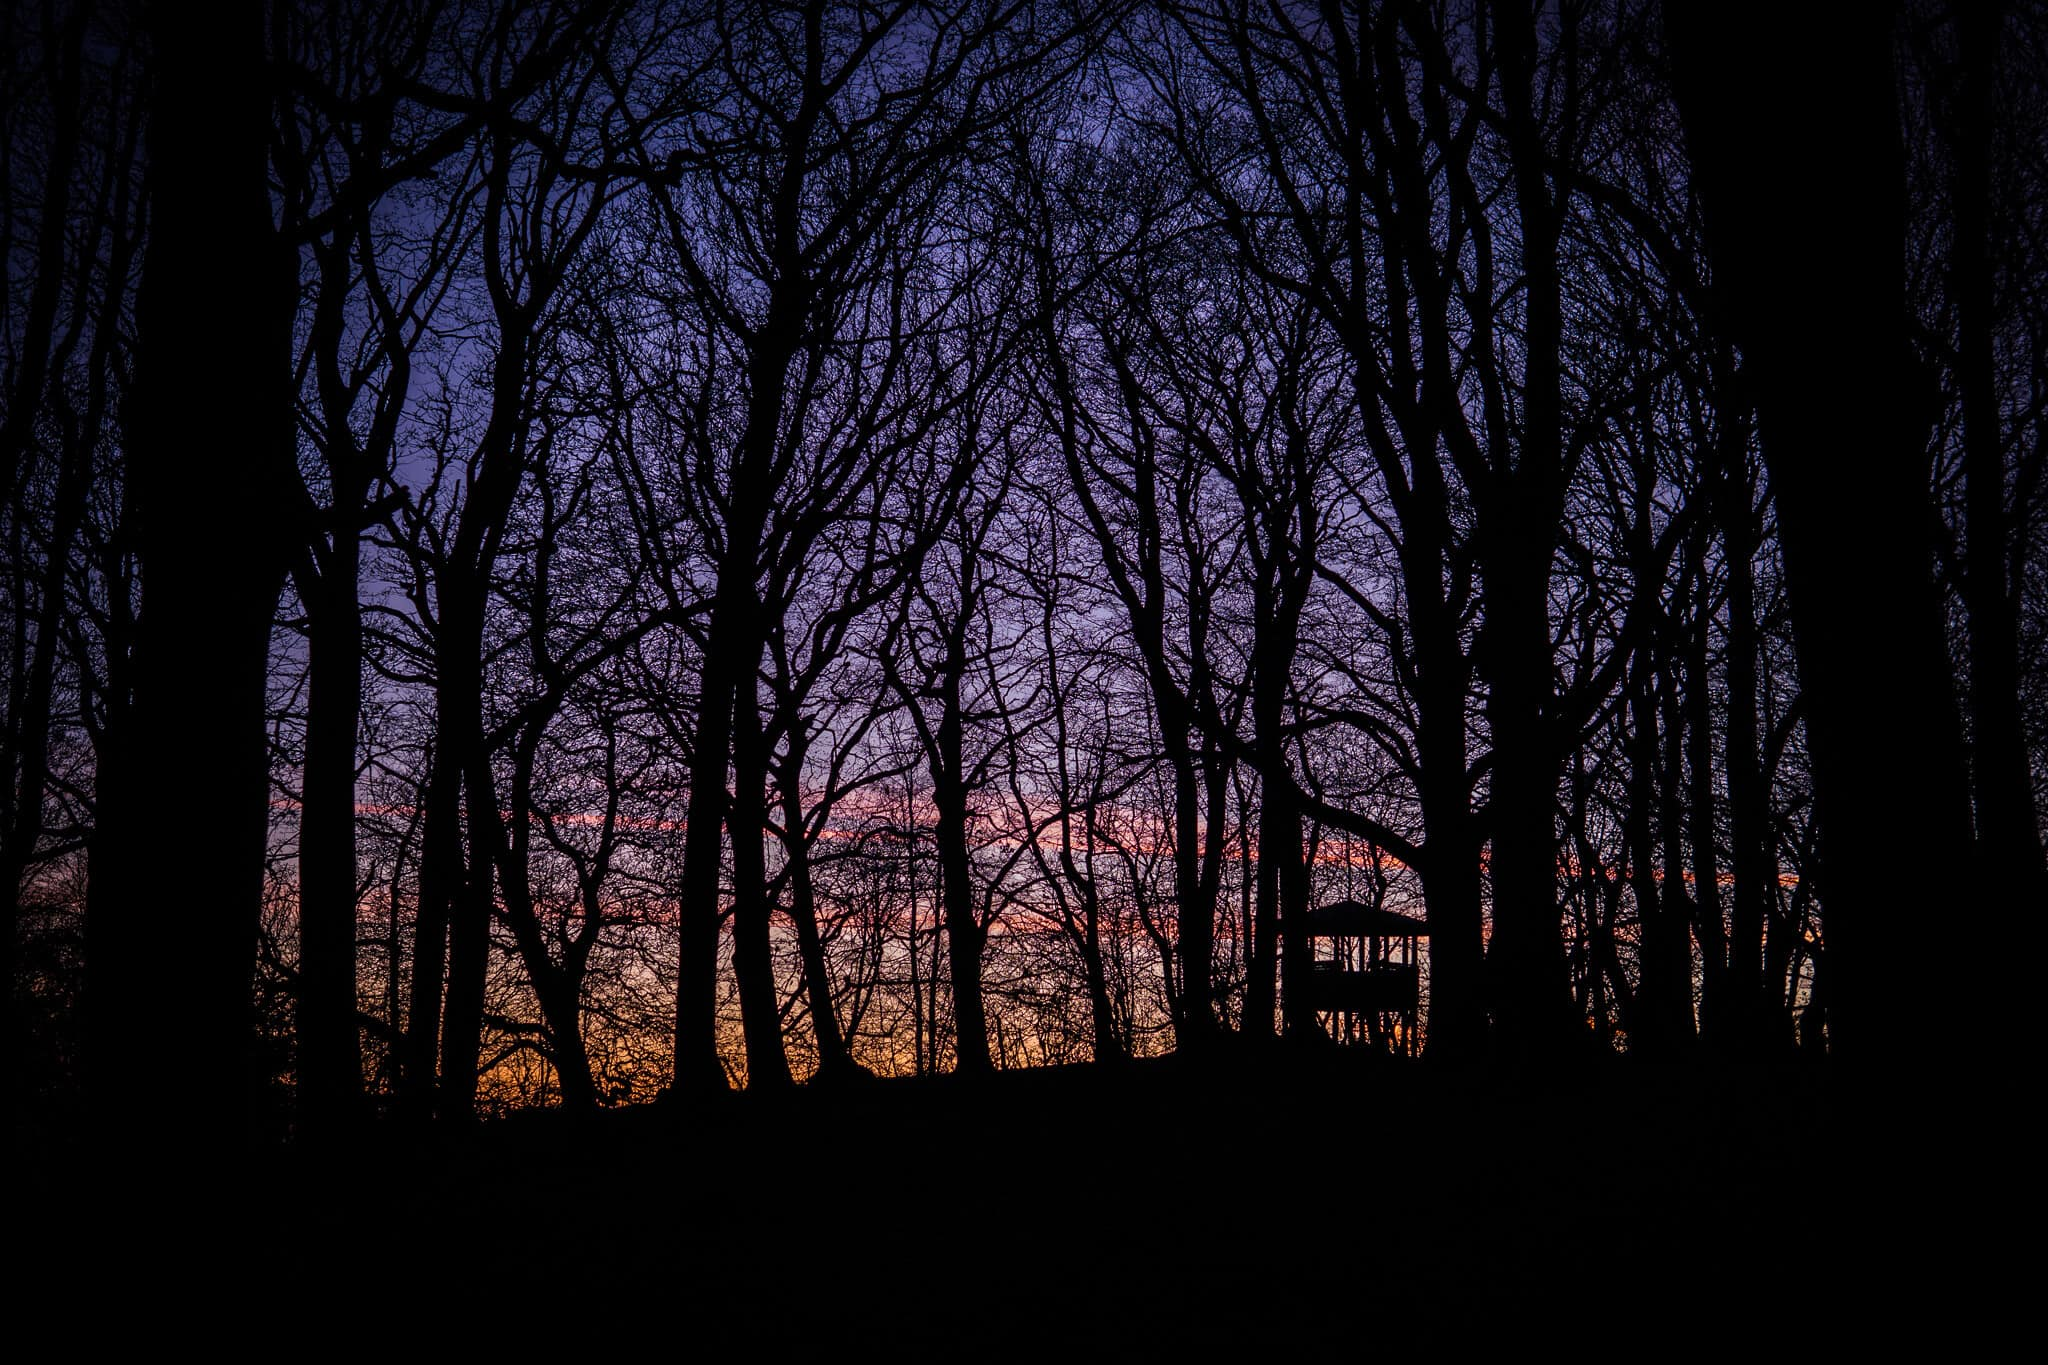 Lipstempel im Wald